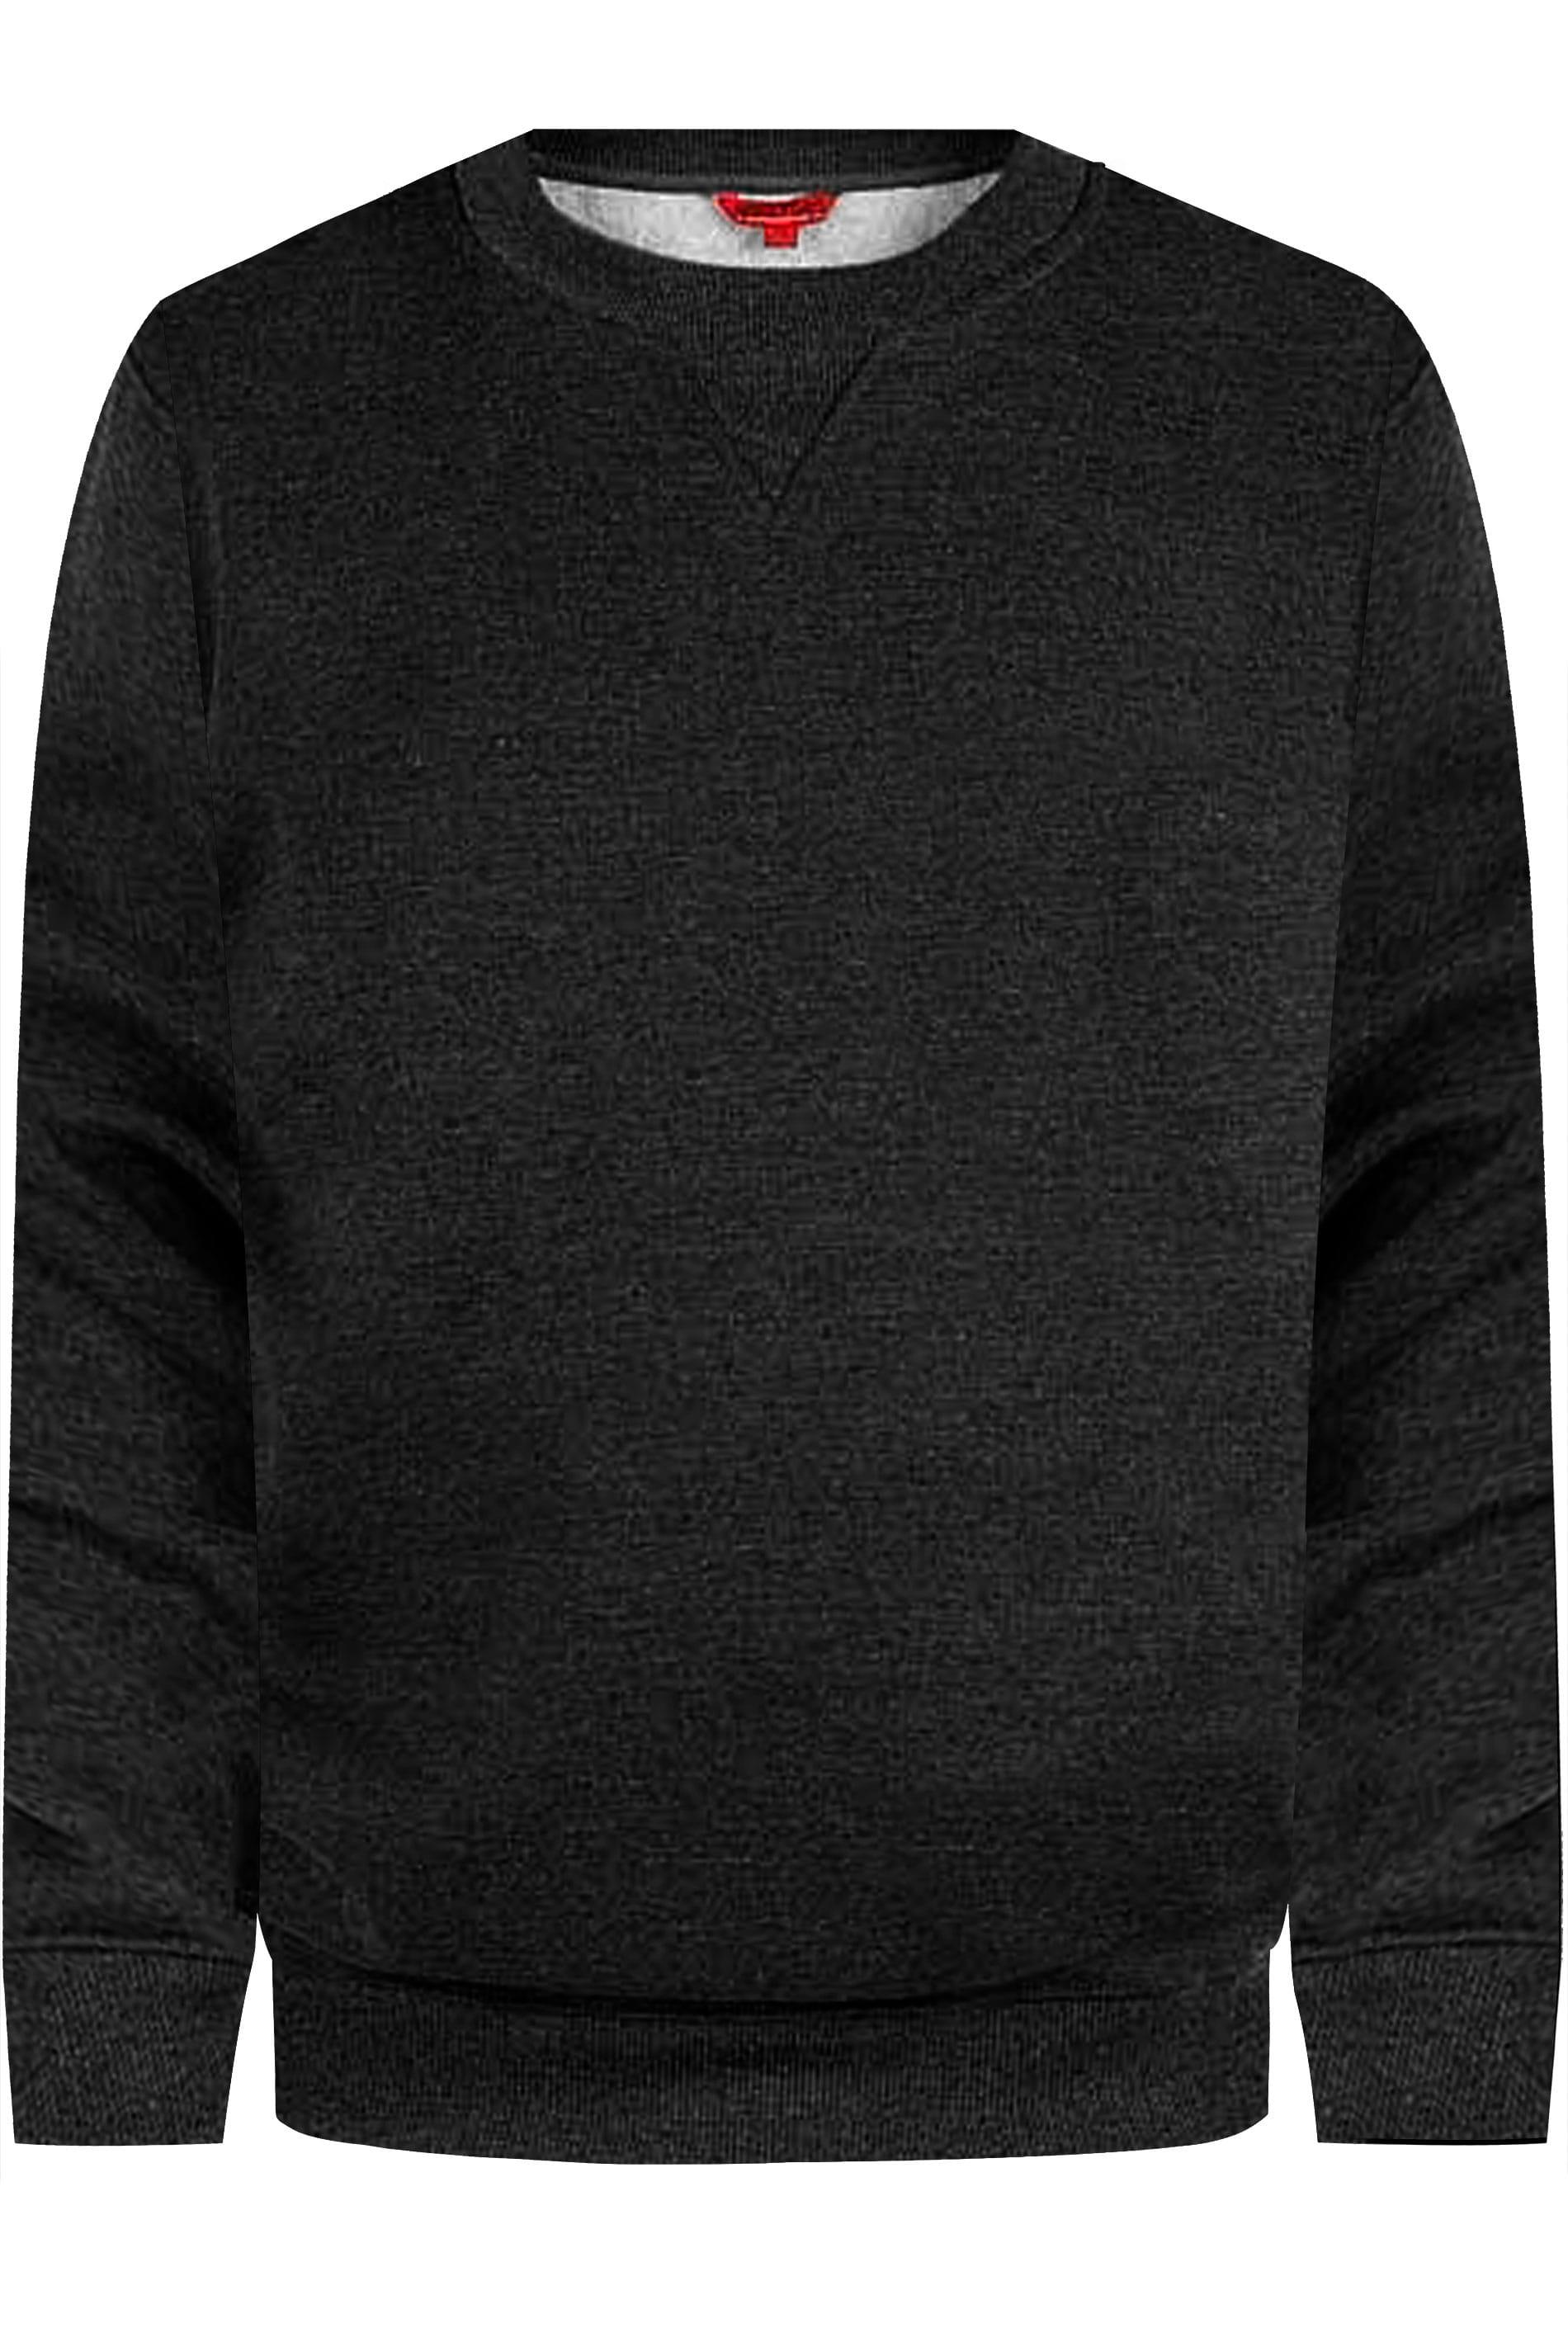 D555 Rockford Black Sweatshirt